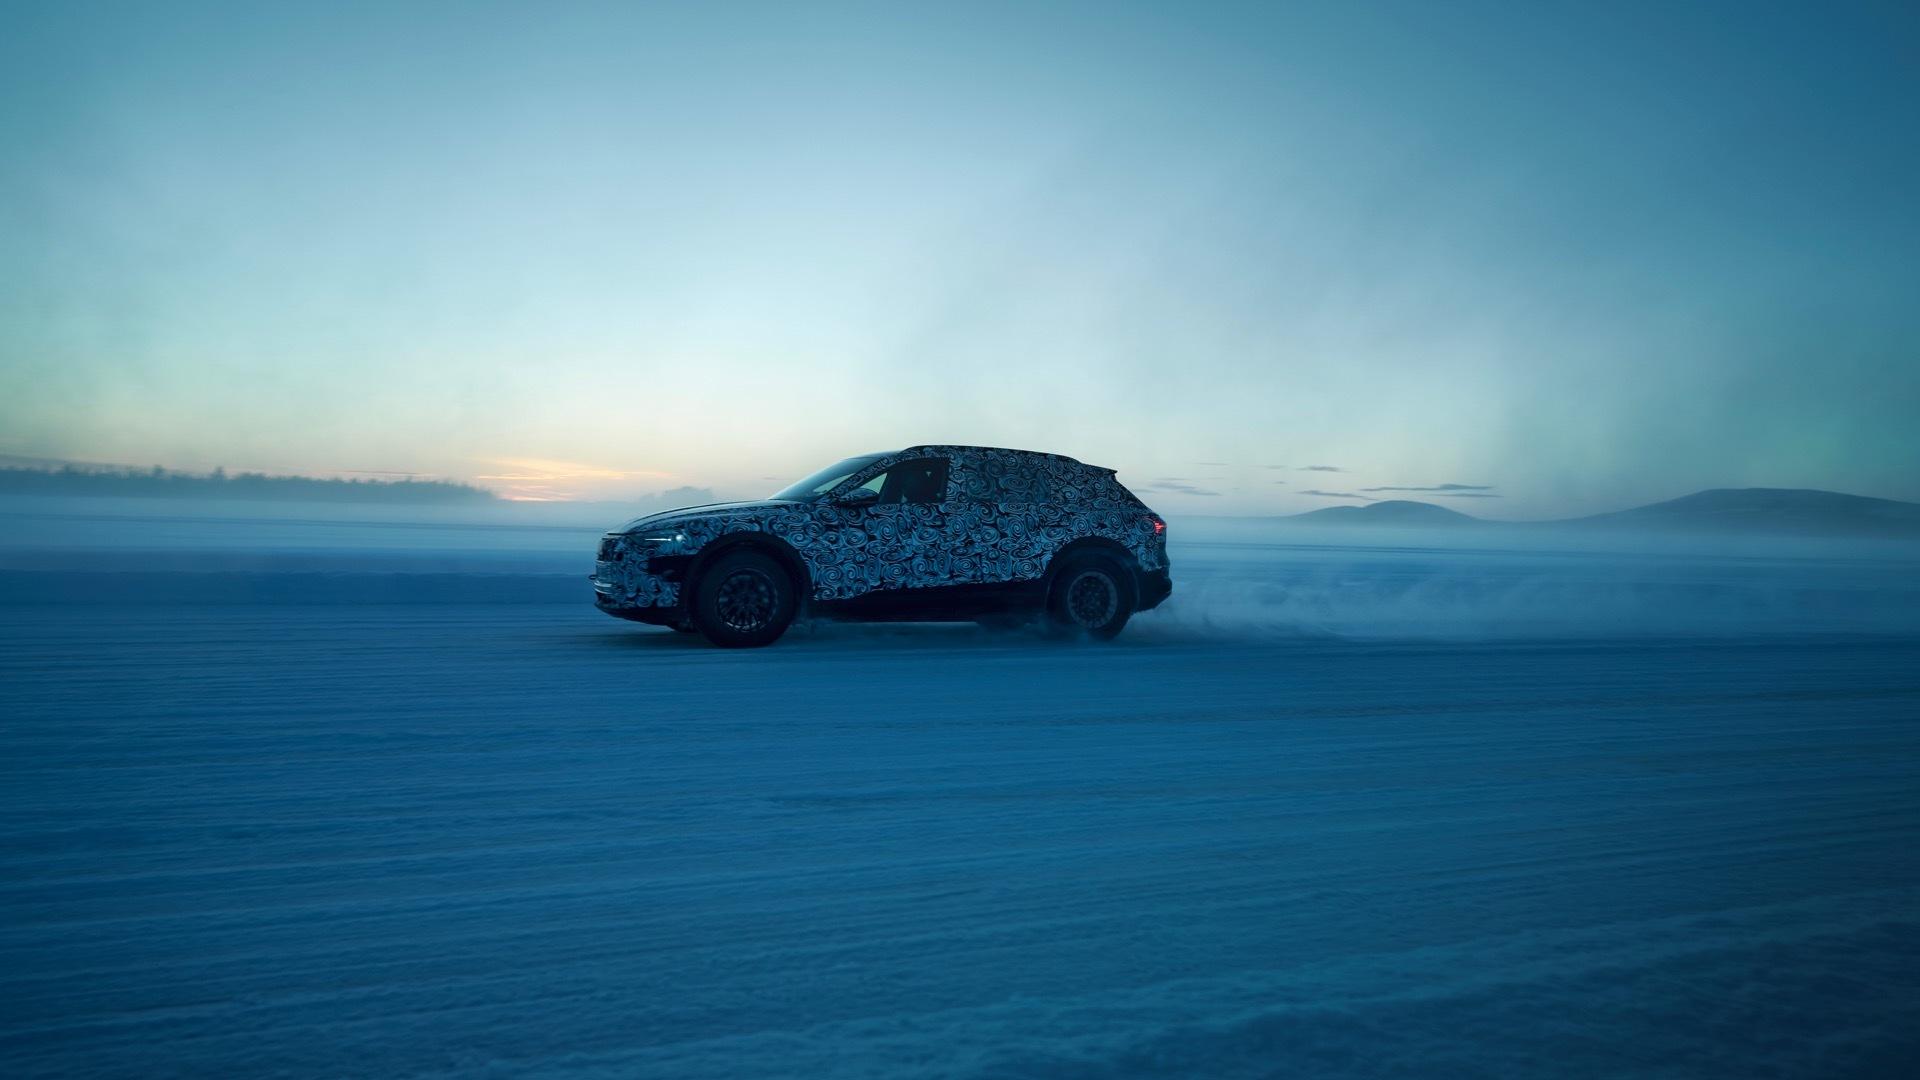 Polarlights – Audi e-tron prototype